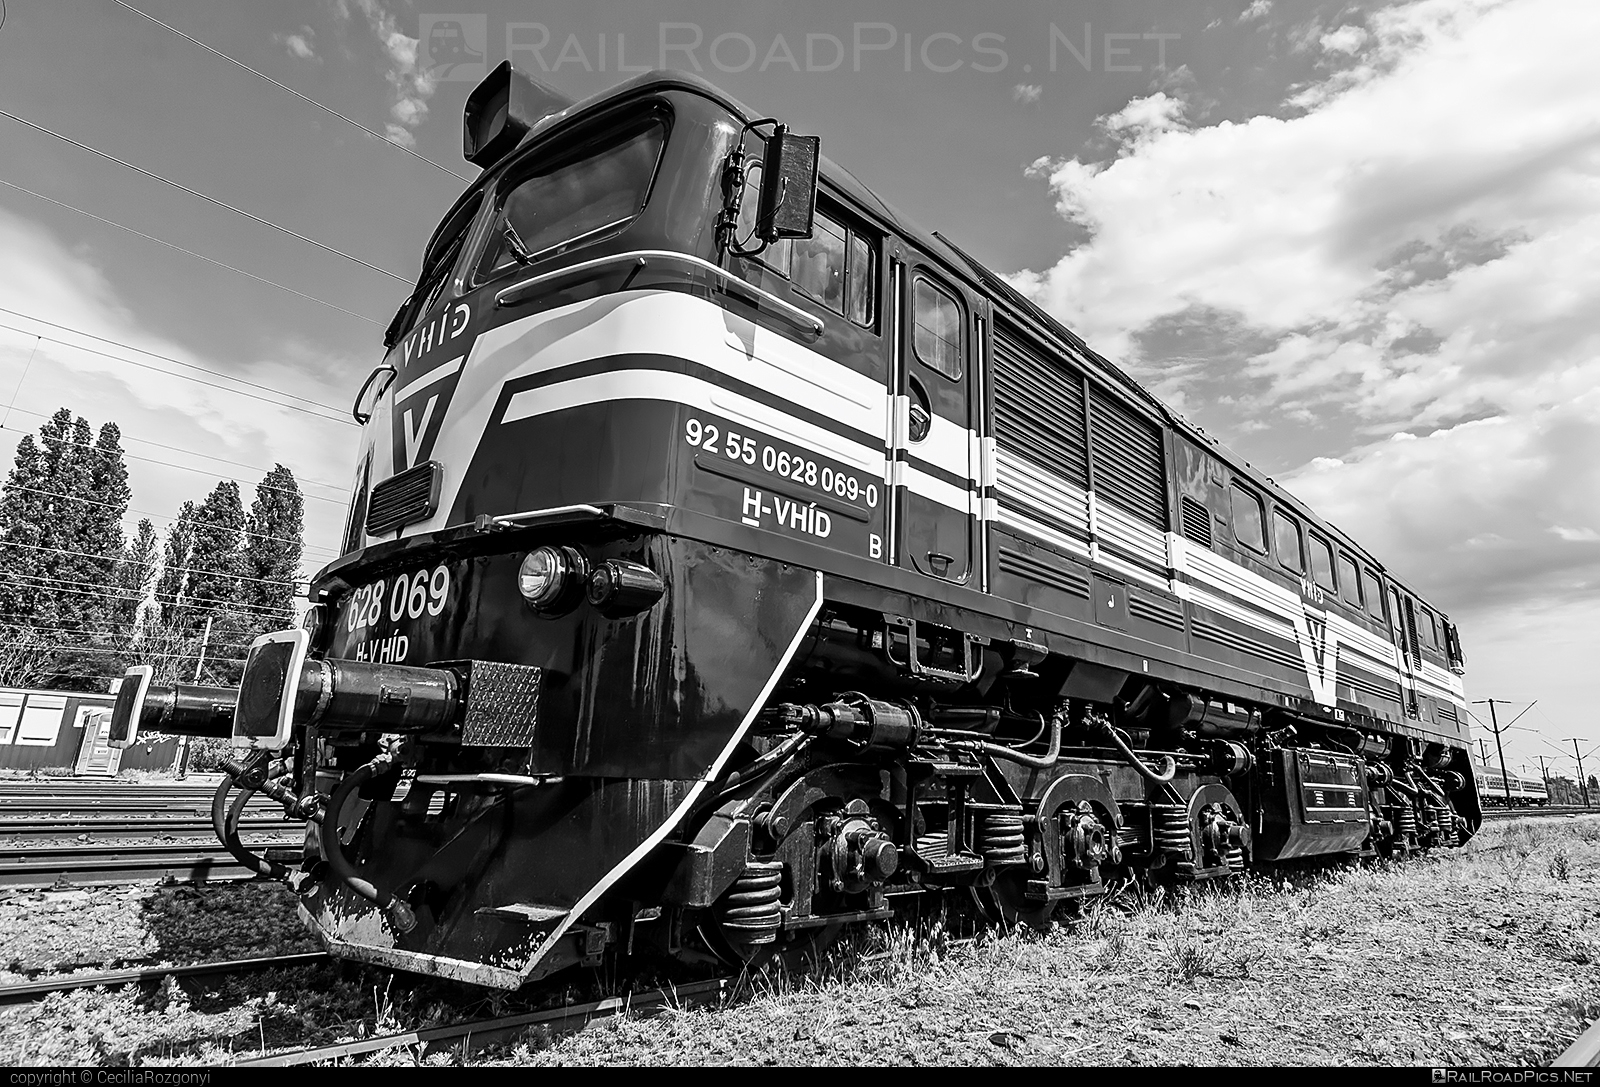 Lugansk M62 - 628 069 operated by V-HÍD Vagyonkezelő Kft. #locomotivem62 #ltz #ltzm62 #lugansk #luganskteplovoz #luhansklocomotiveworks #luhanskm62 #luhanskteplovoz #m62 #m62locomotive